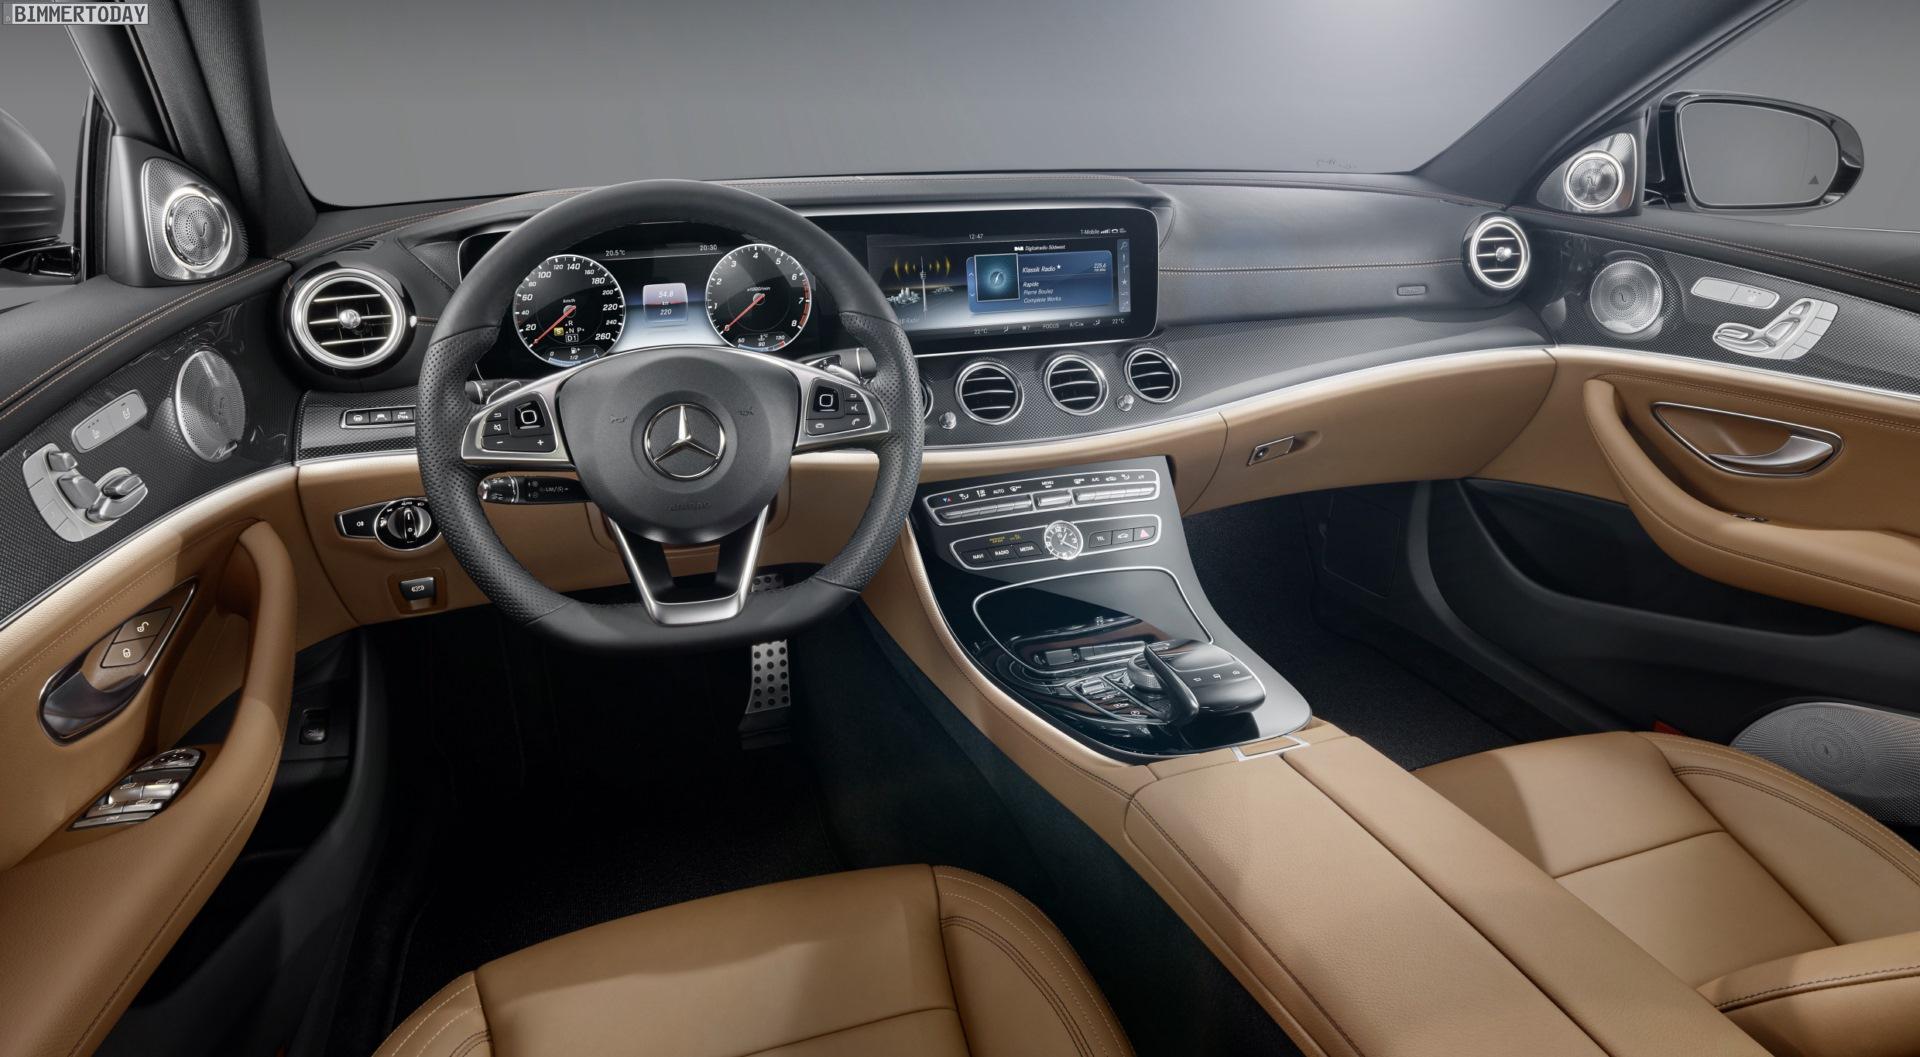 Mercedes E-Klasse 2016: Fotos vom Innenraum des 5er-Rivalen